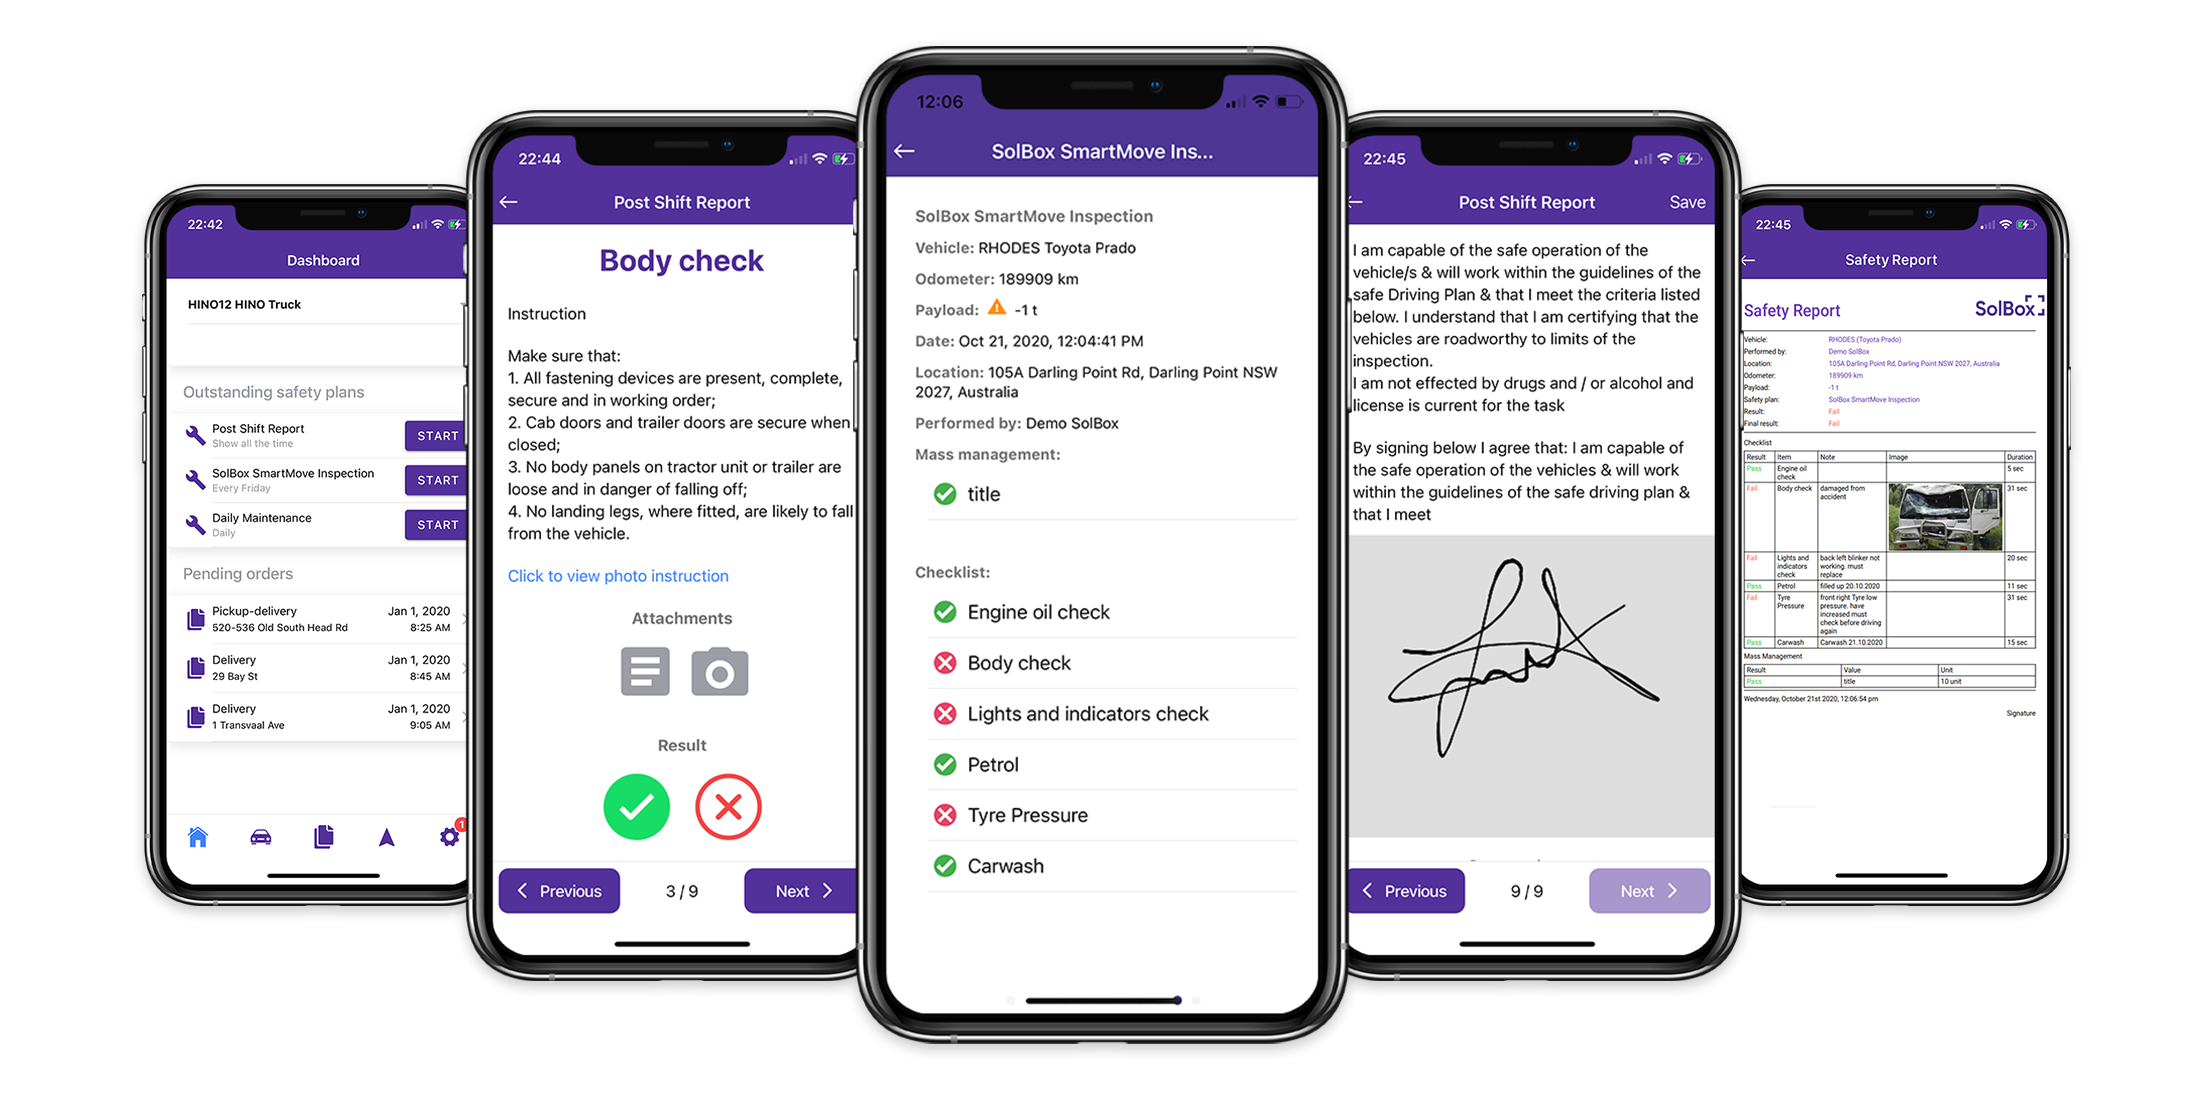 Driver PreStart App  COR, Mass Management, Live fault notifications, Customized Questions, Driver declaration, Photos, Comments, Live GPS Location.